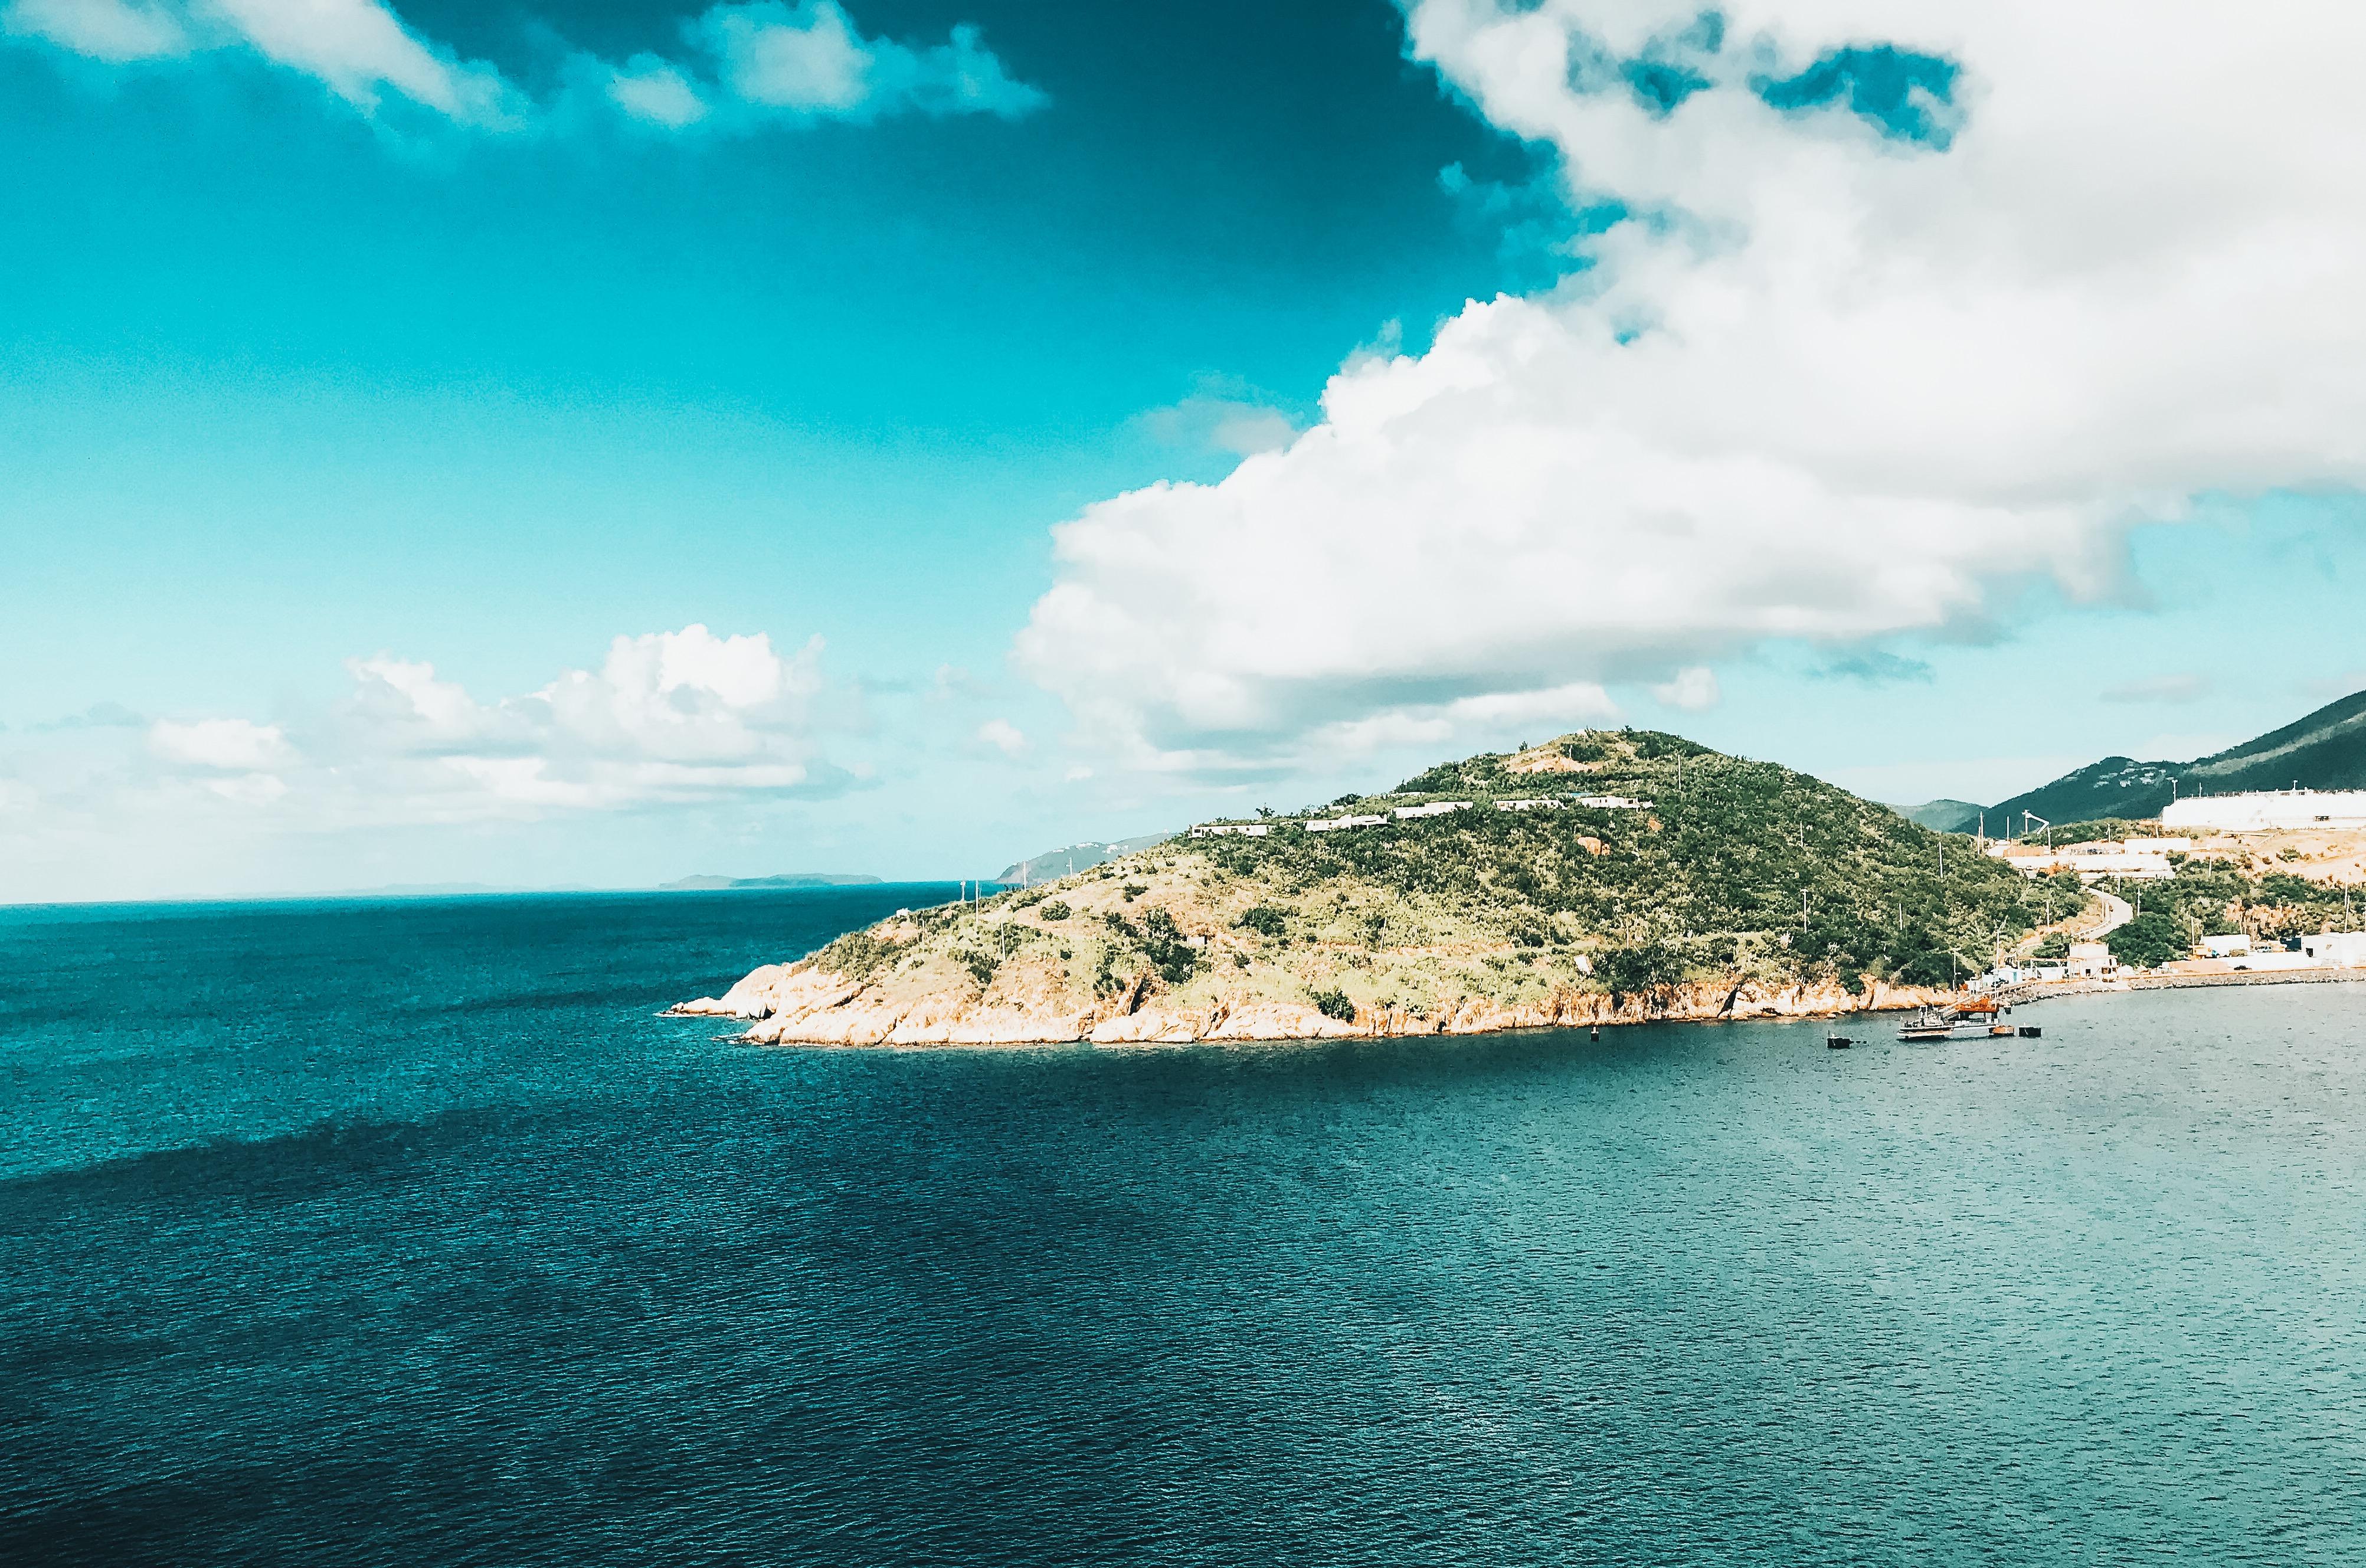 St. Thomas Island